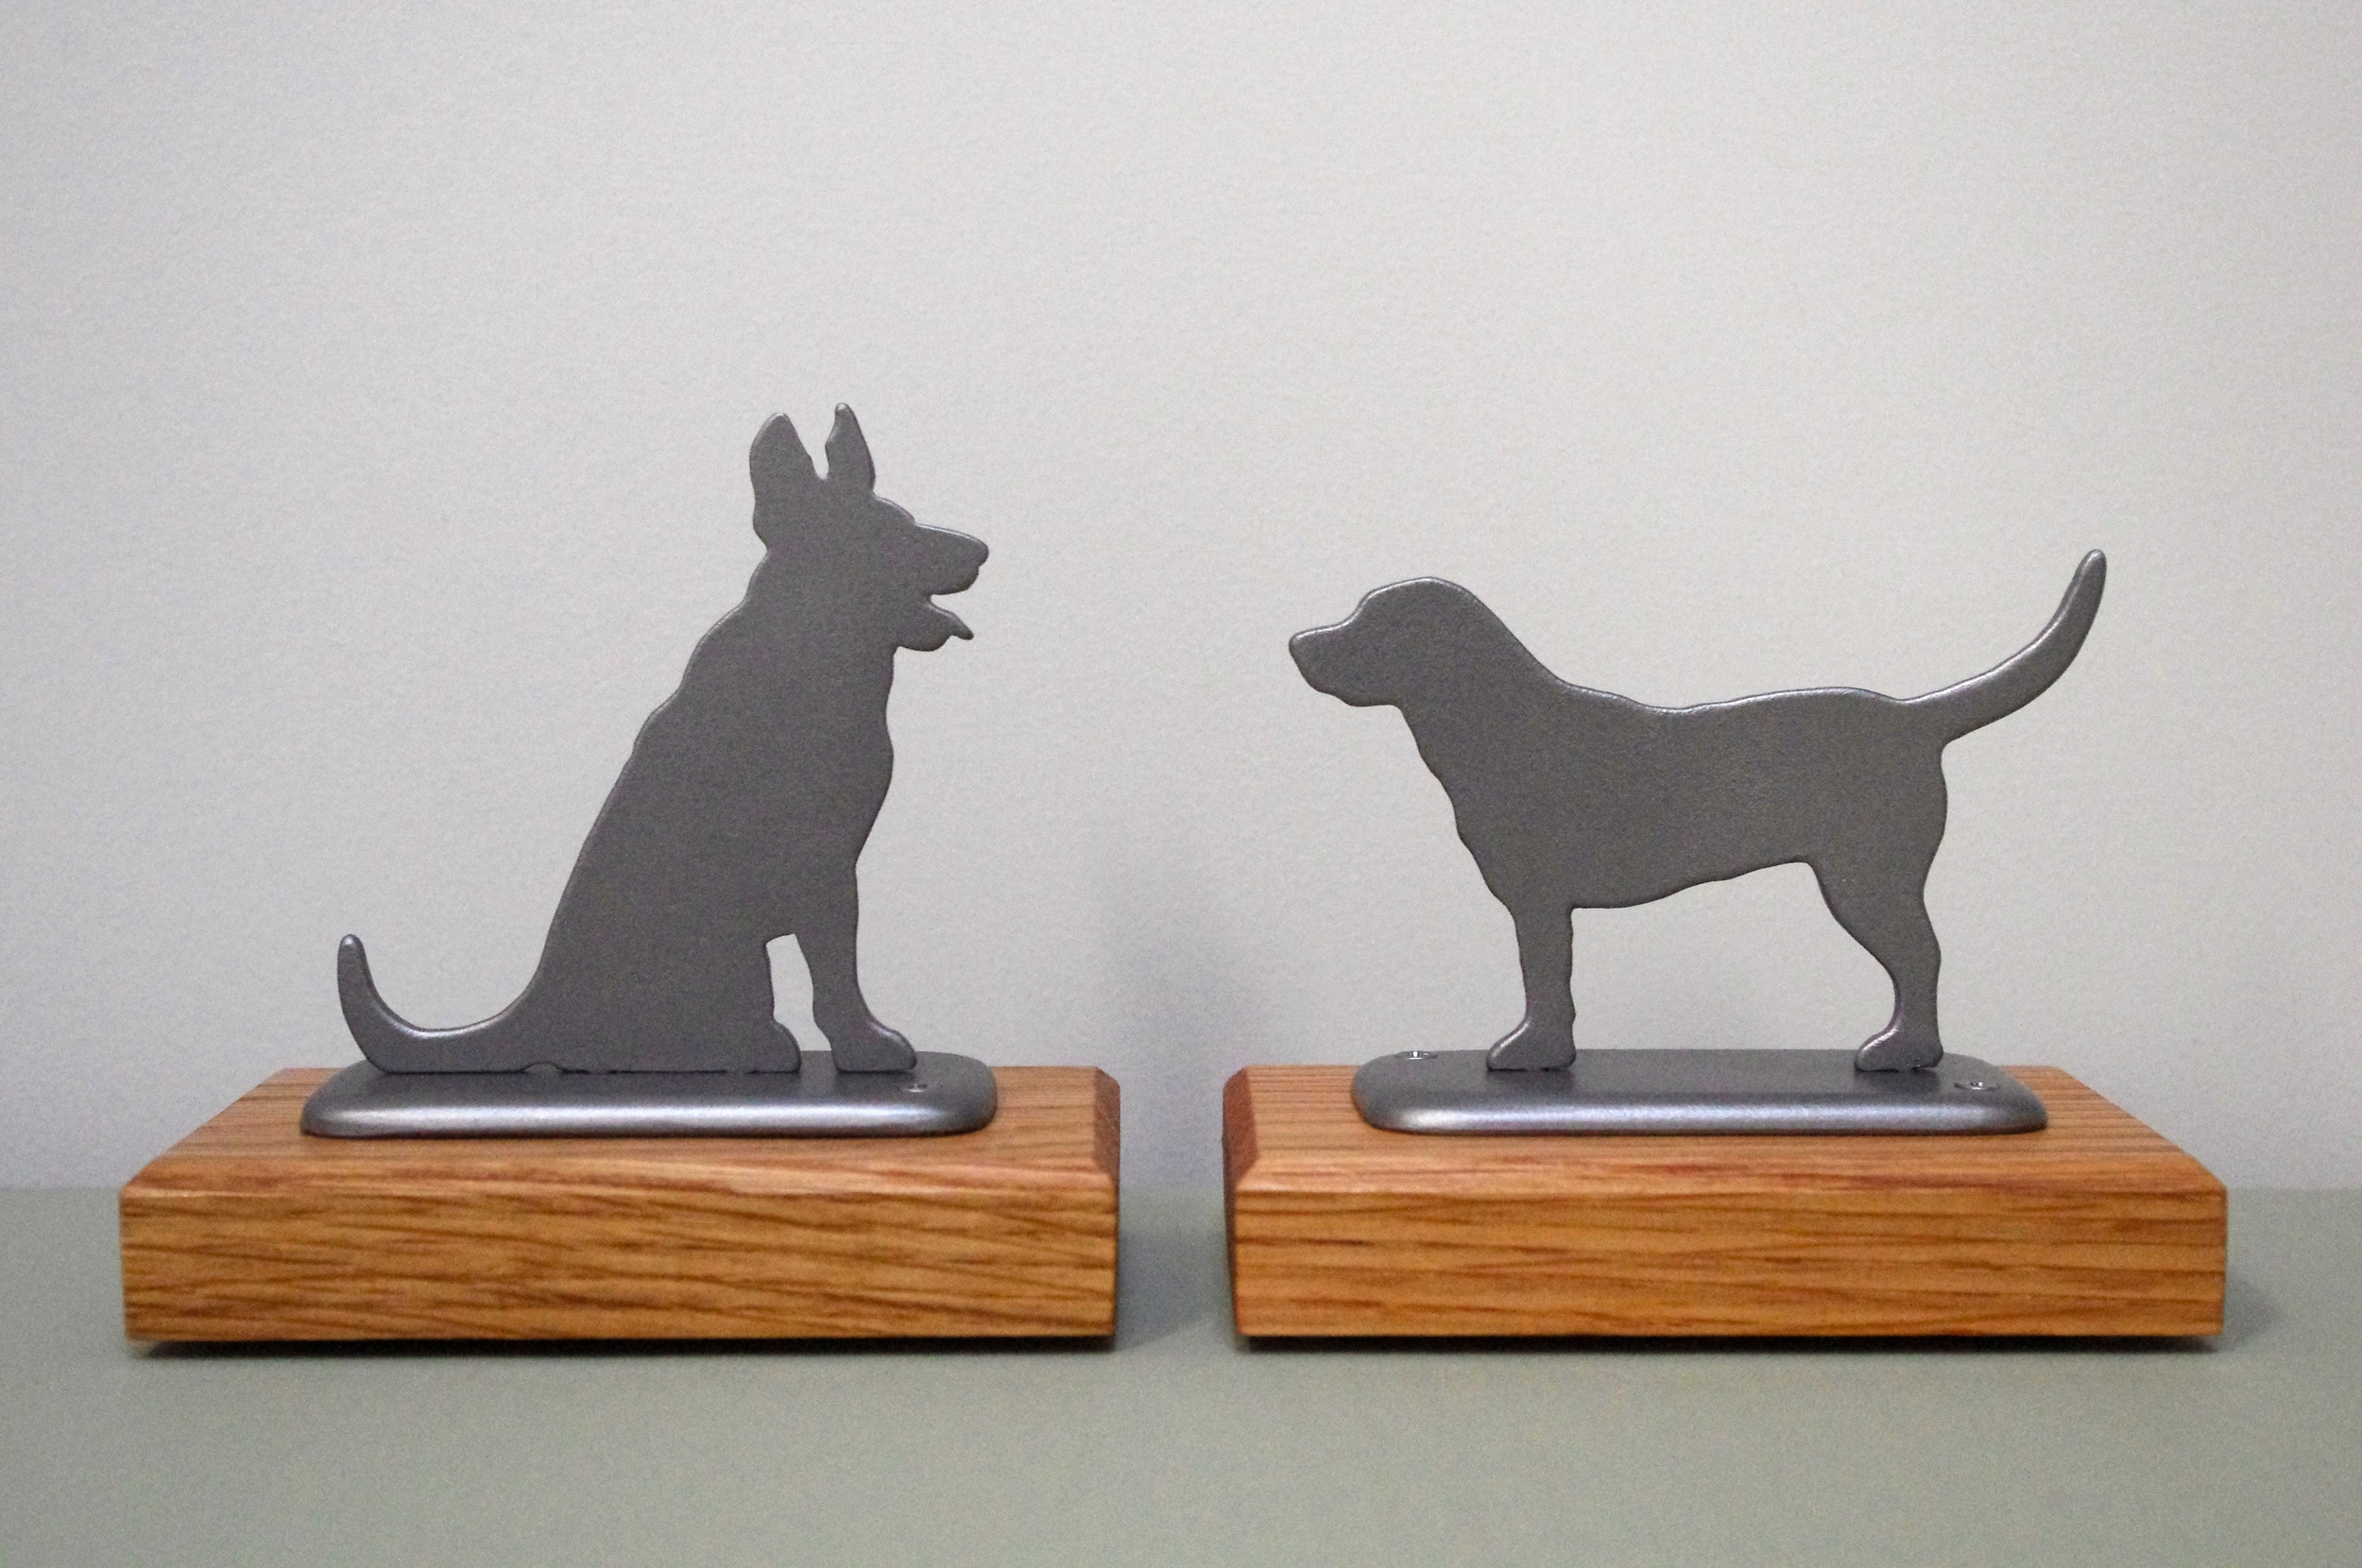 Dog Show Awards